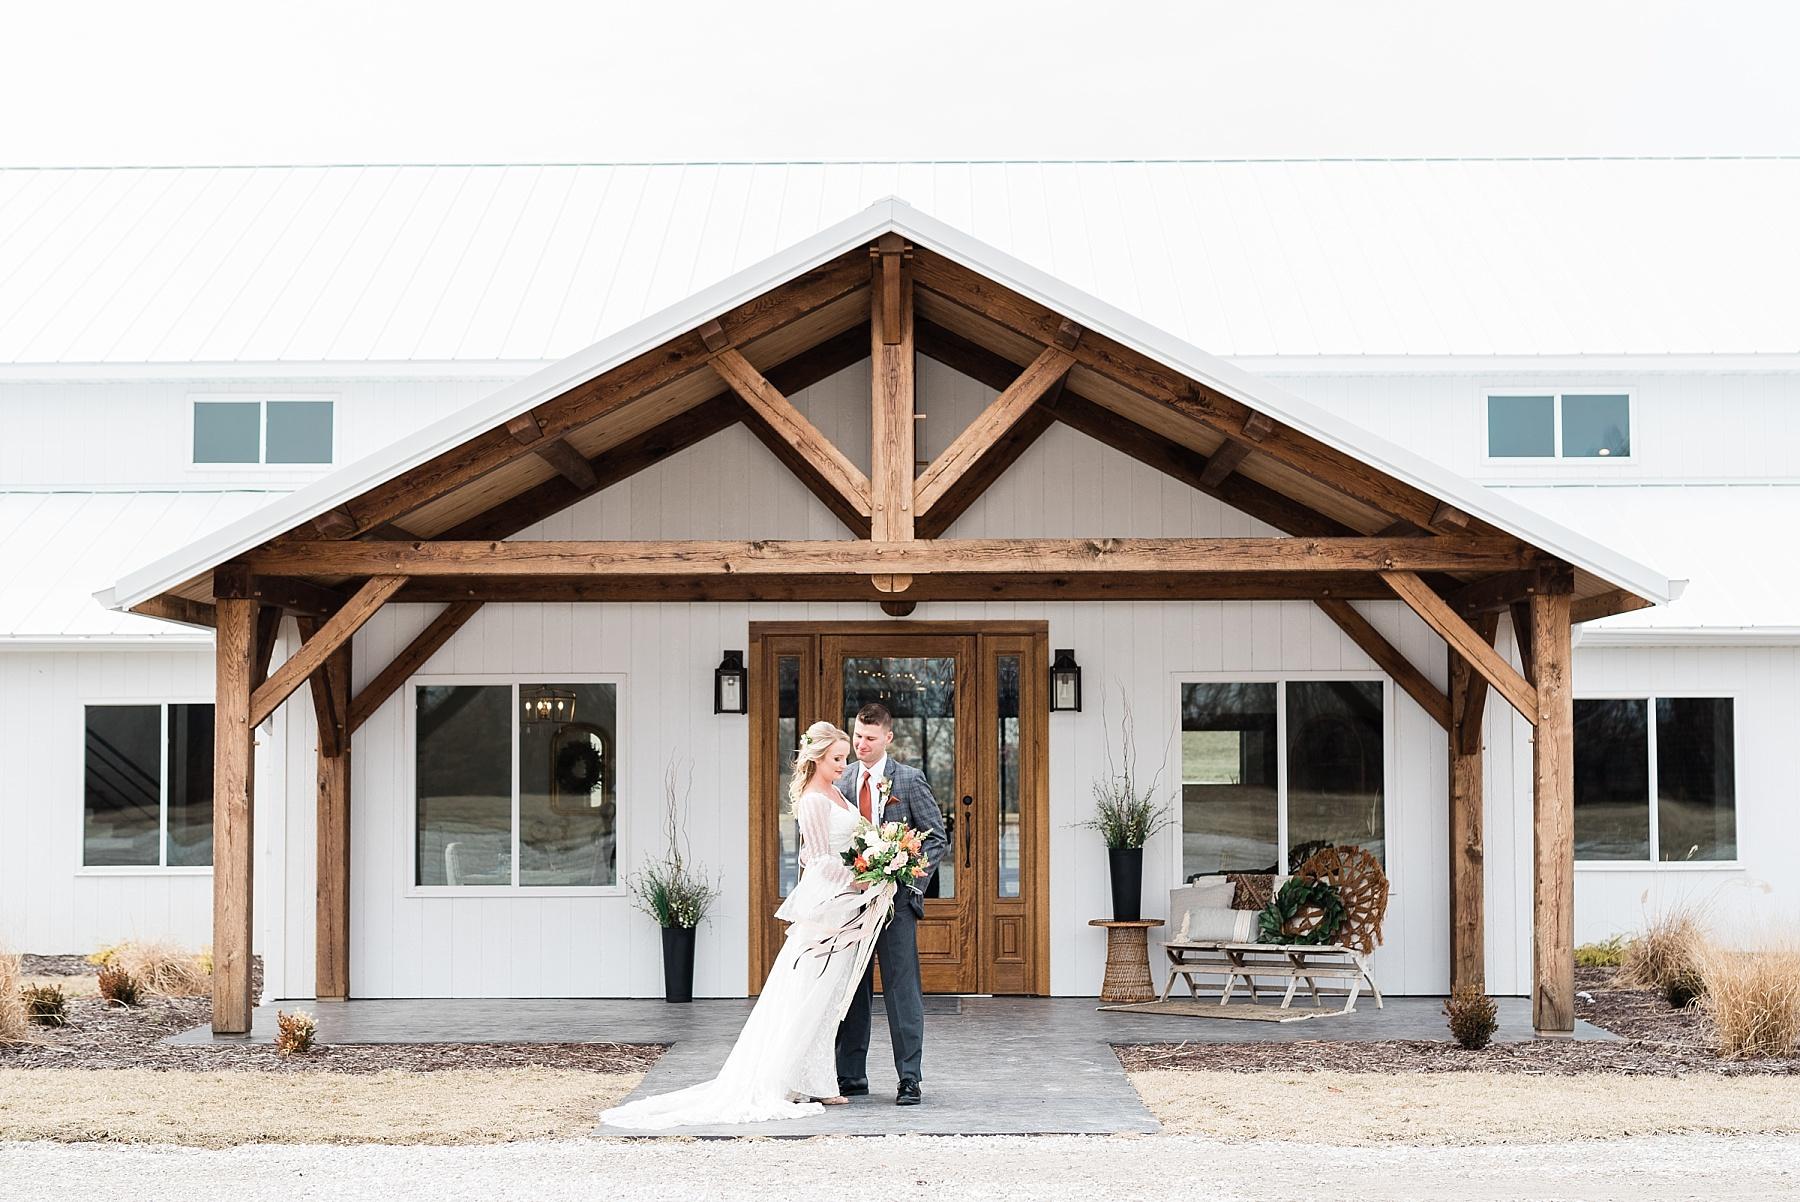 Eclectic Scandinavian Winter Wedding in All White Venue Emerson Fields by Kelsi Kliethermes Photography Best Missouri and Maui Wedding Photographer_0020.jpg